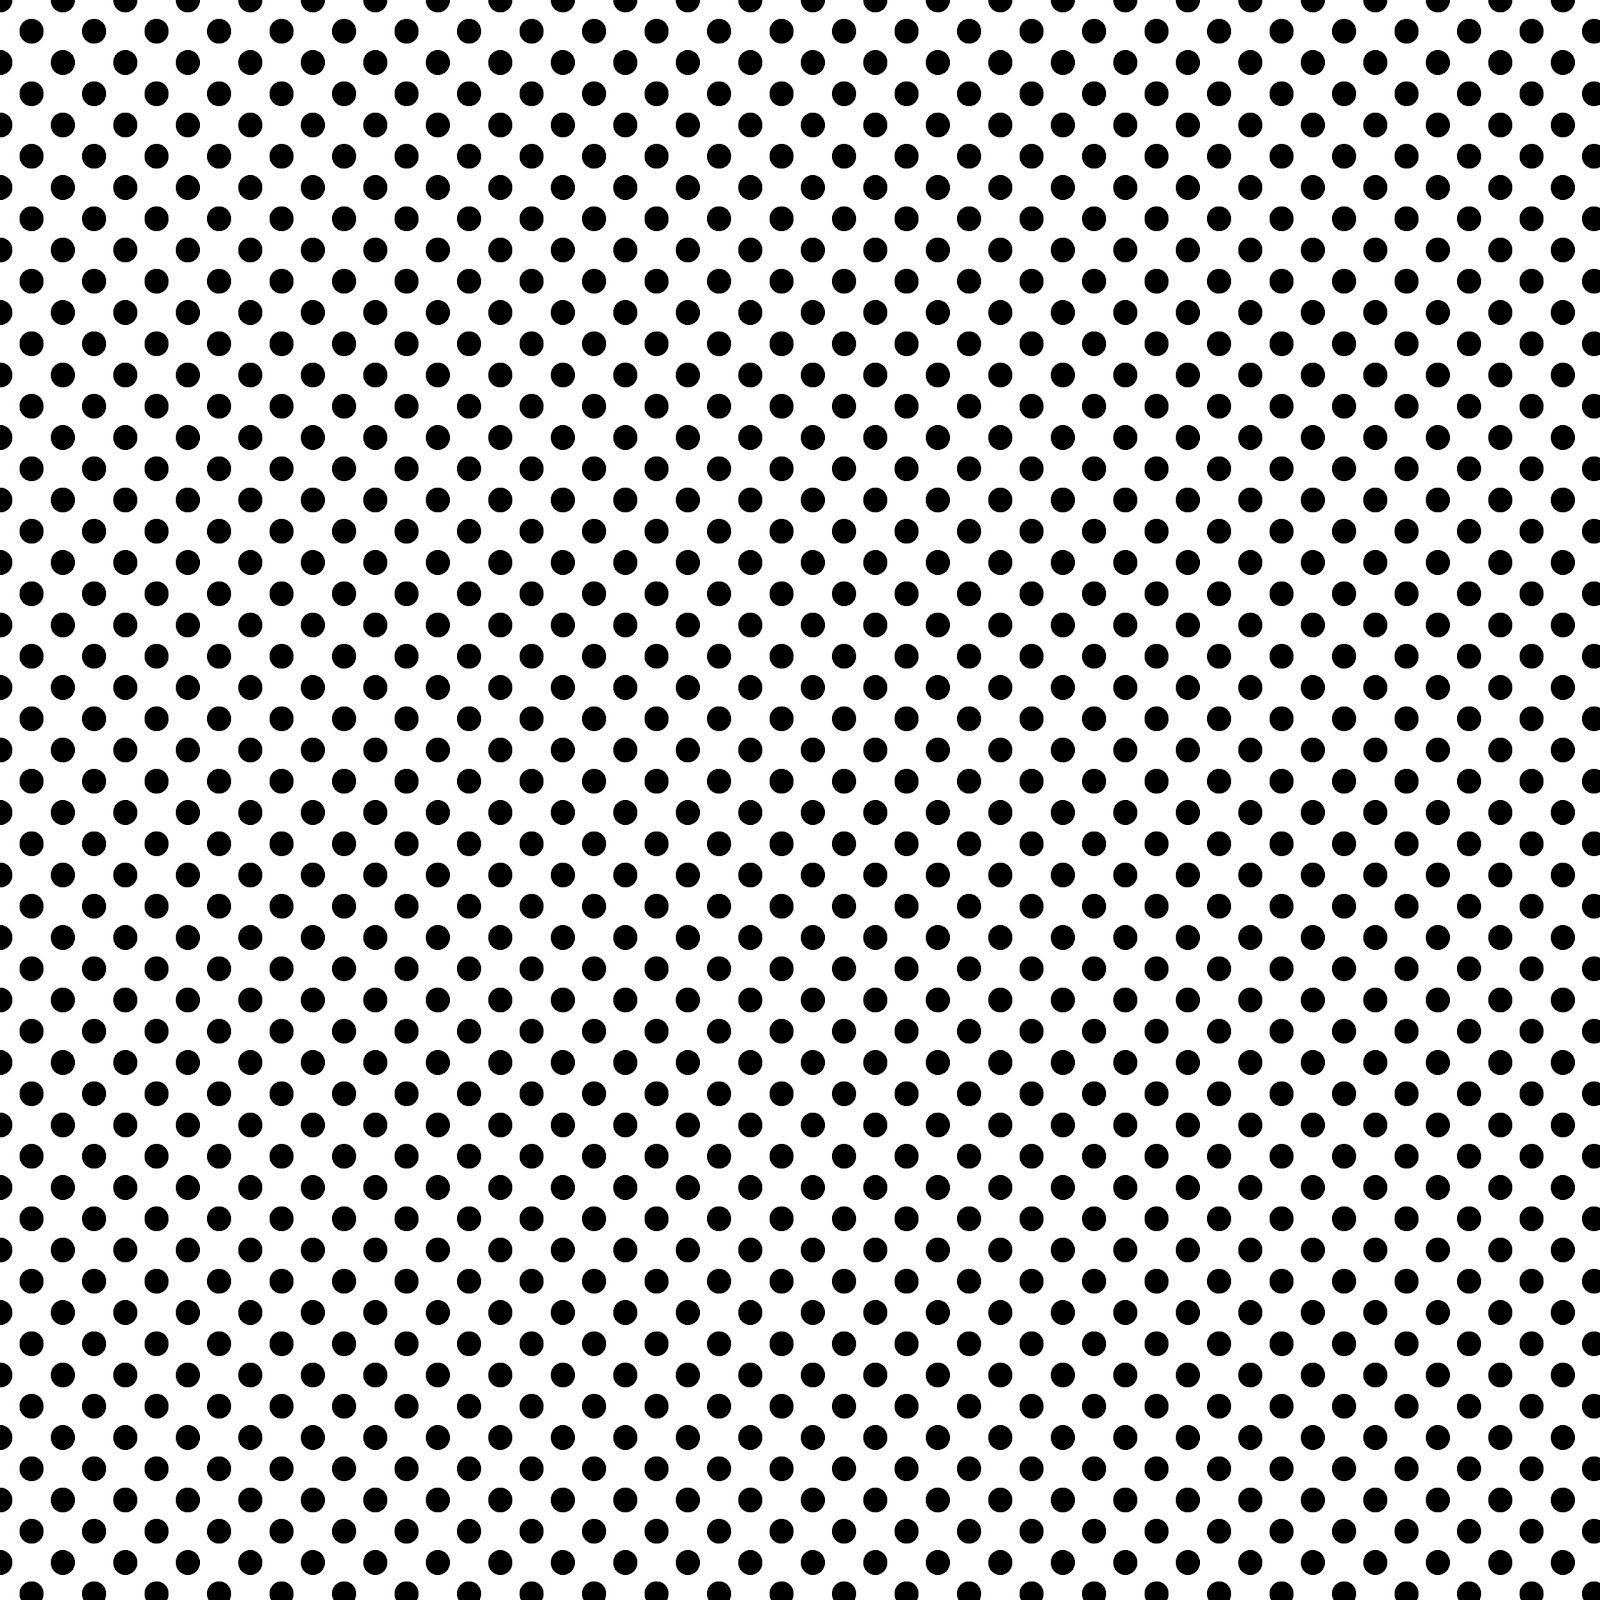 Mini Black Polka Dots On White From Free Vintage Digital